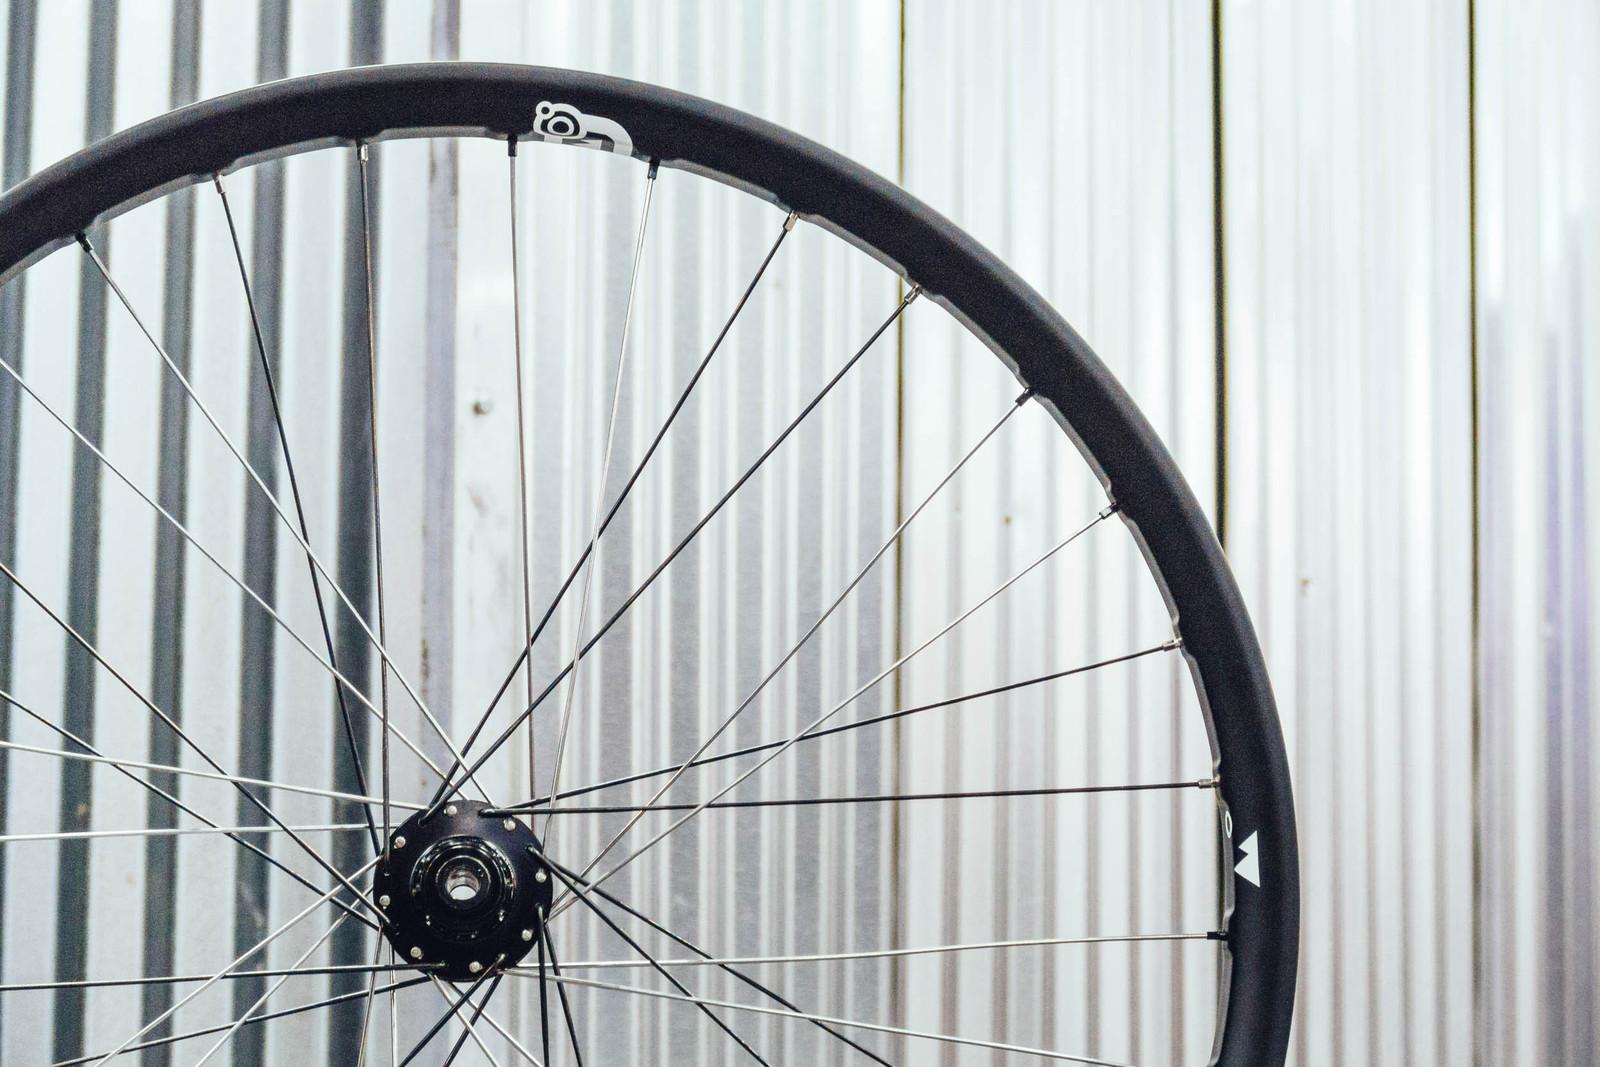 Unique Spoke Lacing in These Custom Handbuilt Carbon Wheels from Colorado